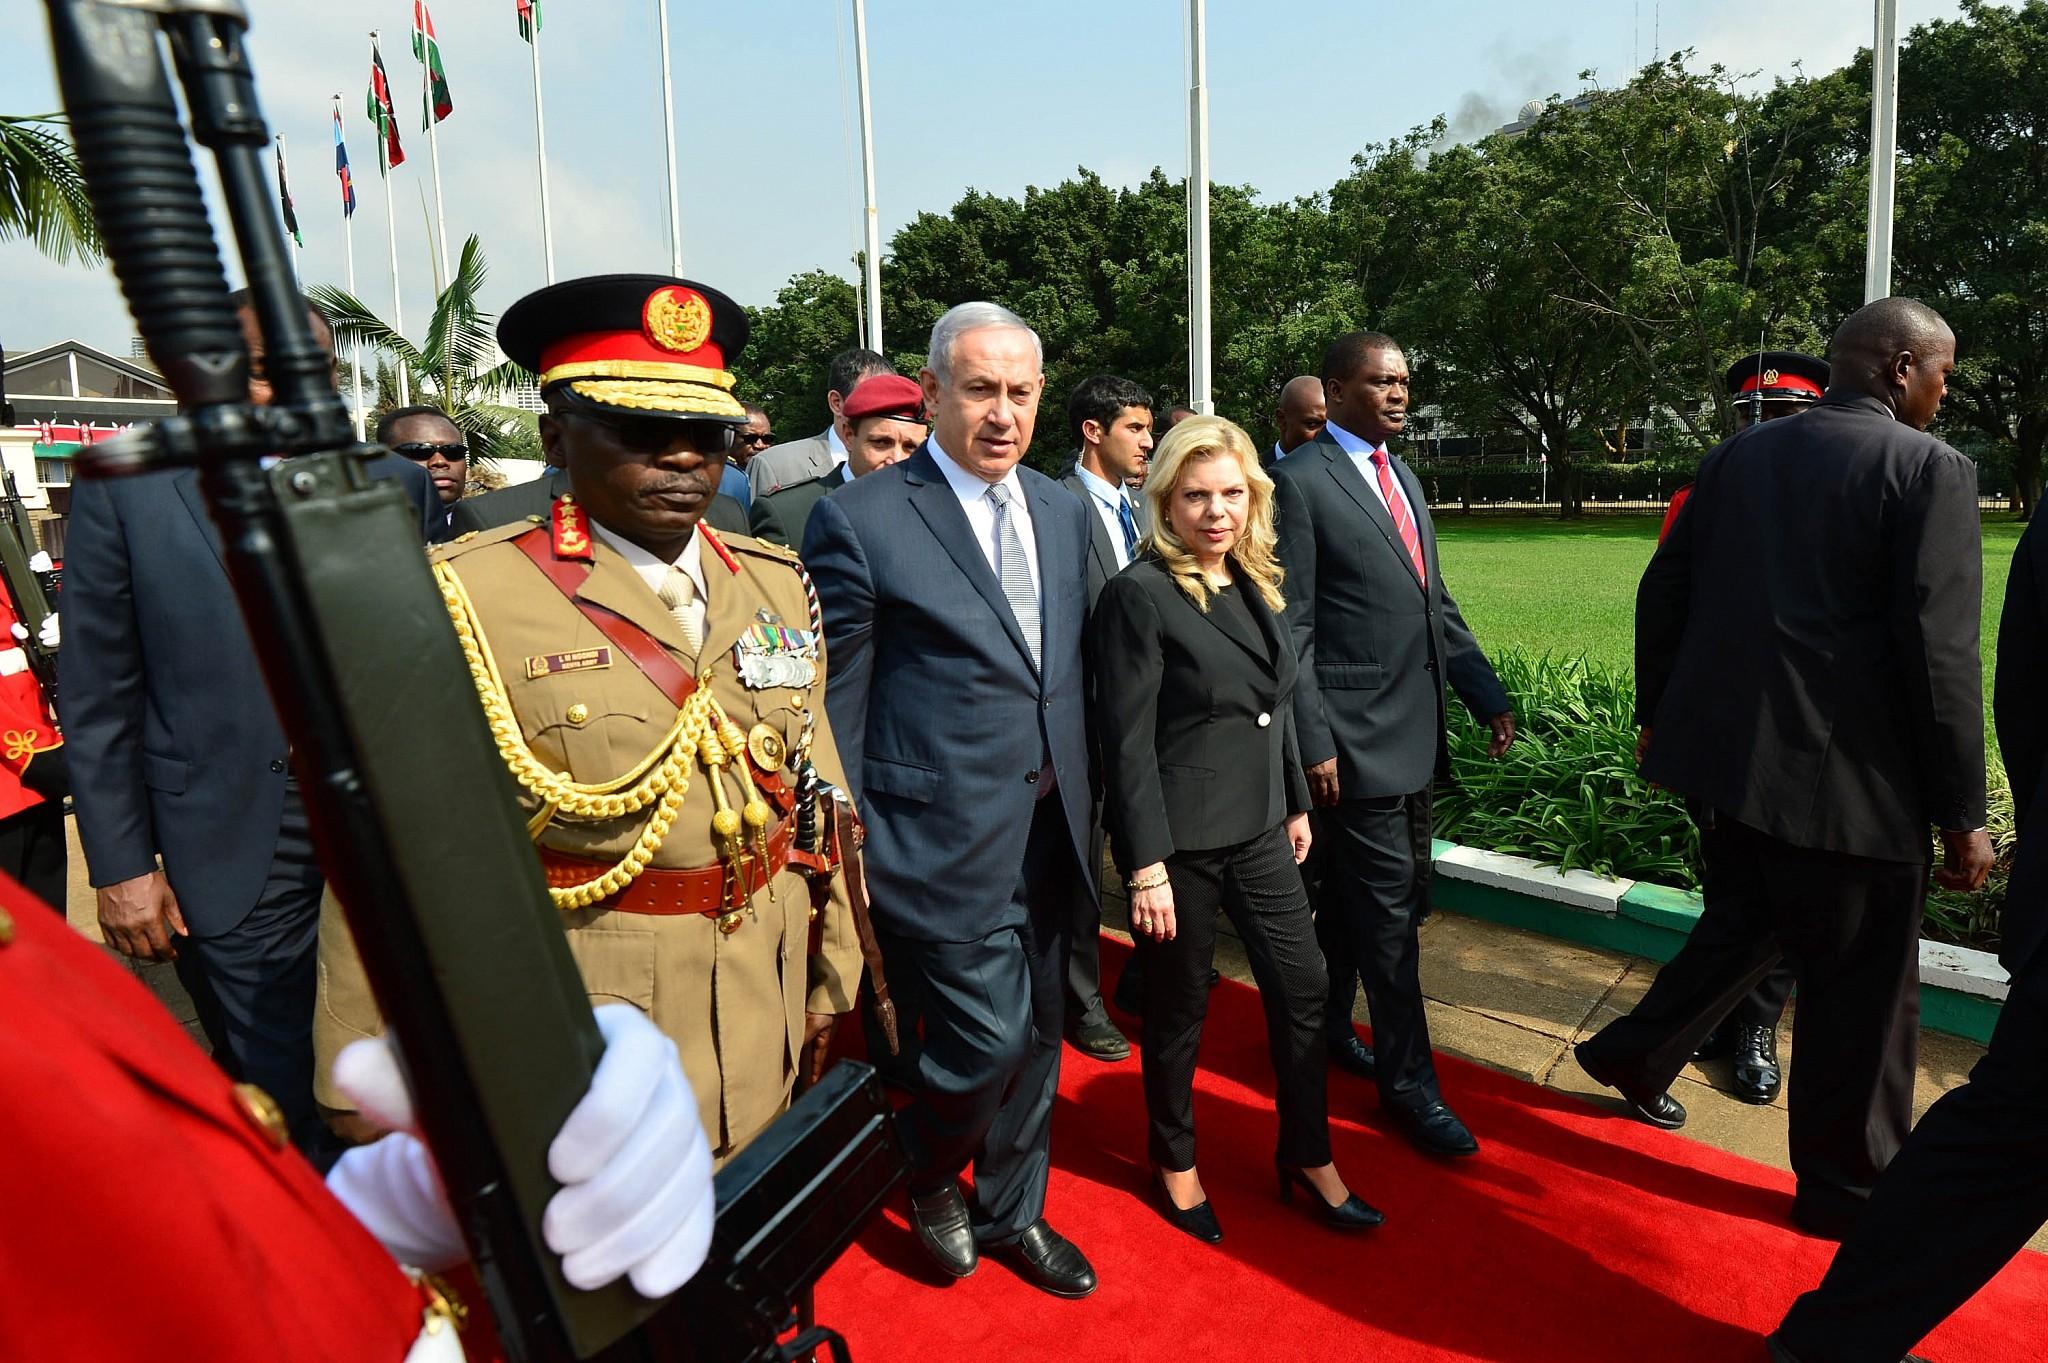 Israel to open embassy in Rwanda: Netanyahu